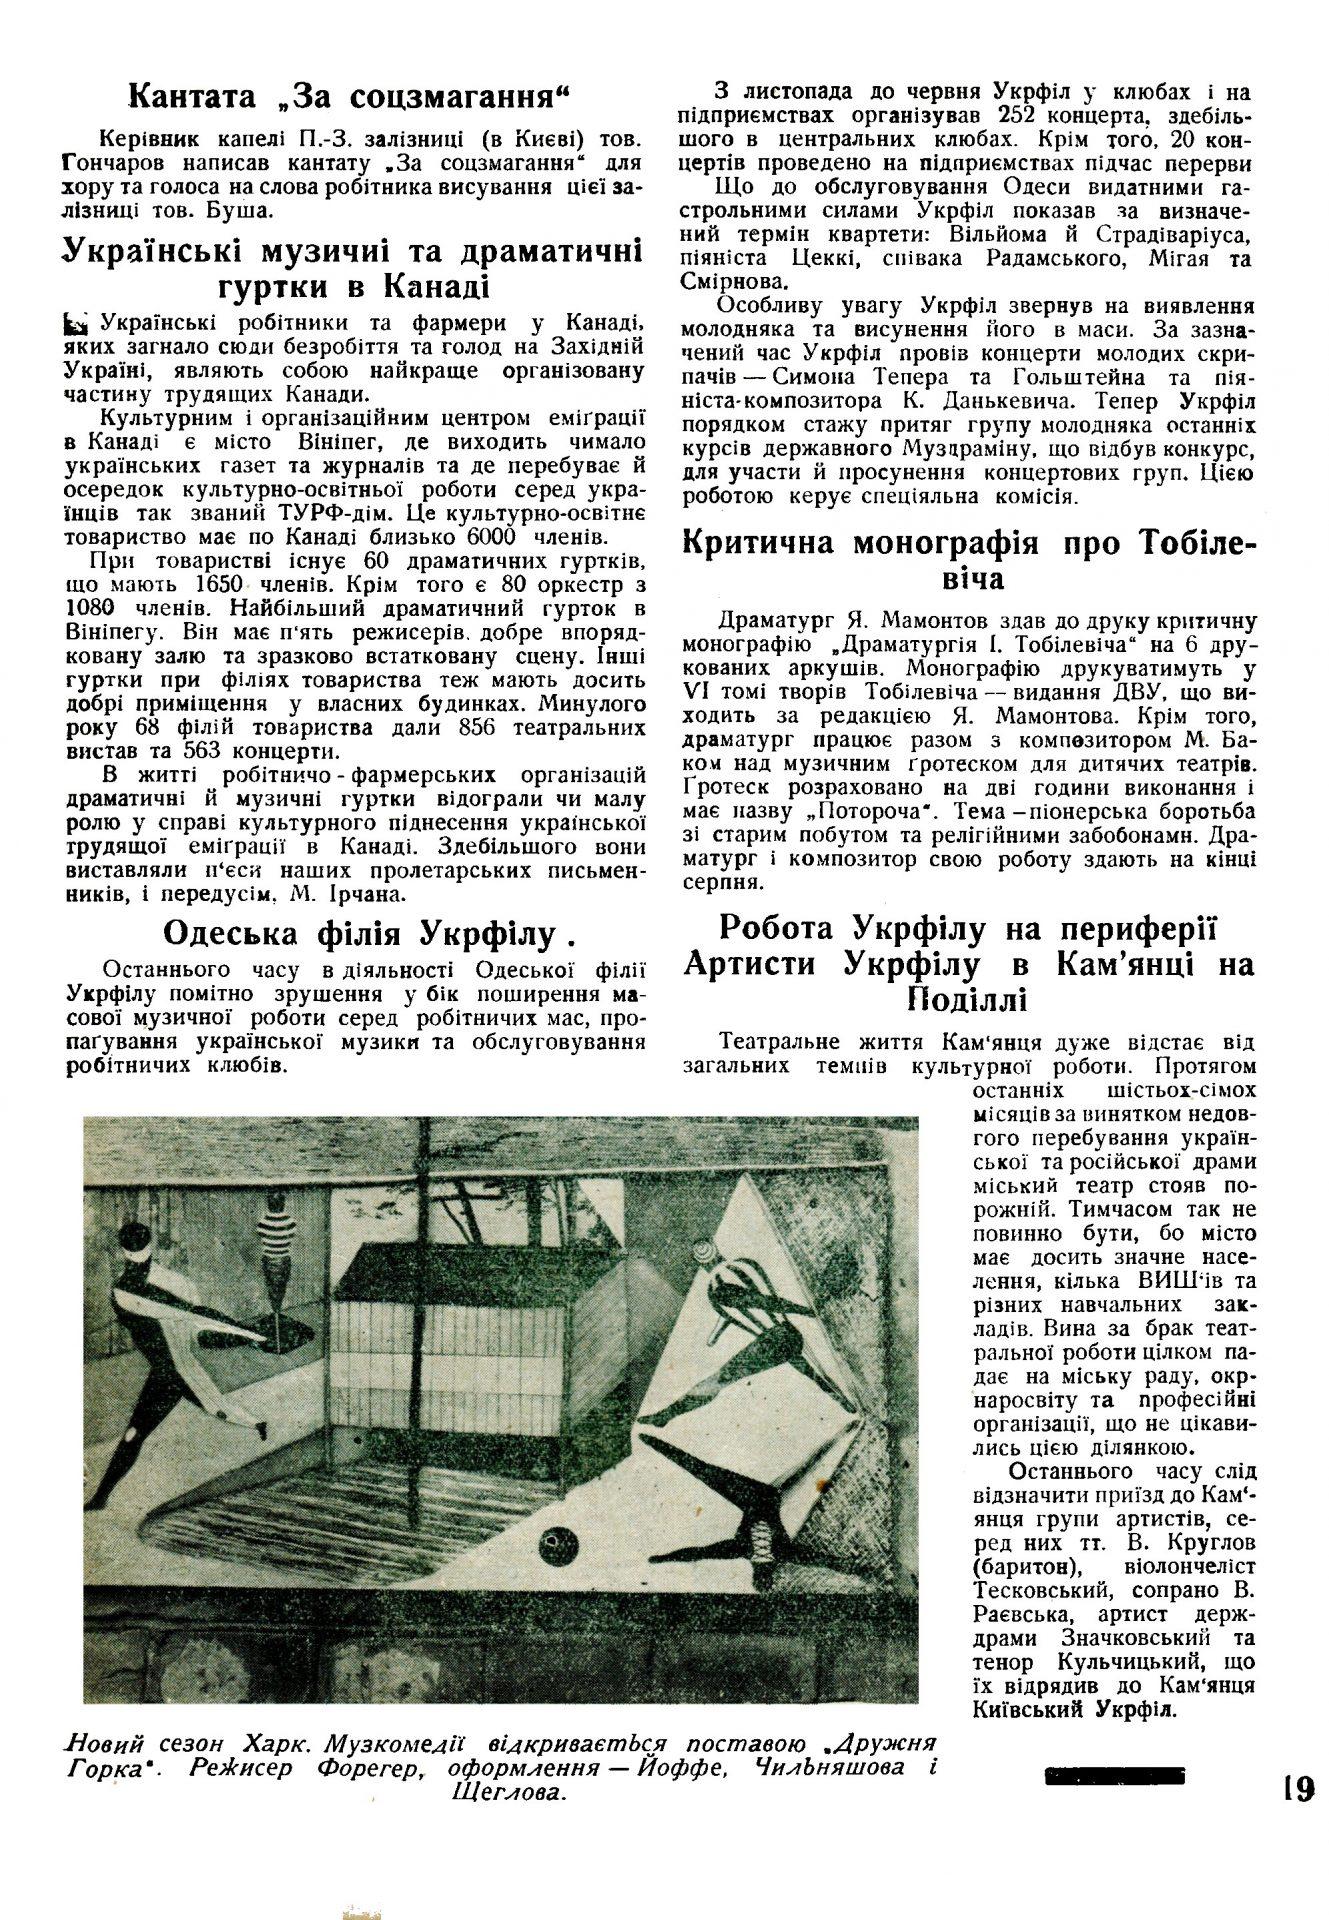 Мистецька трибуна_1930_№ 11